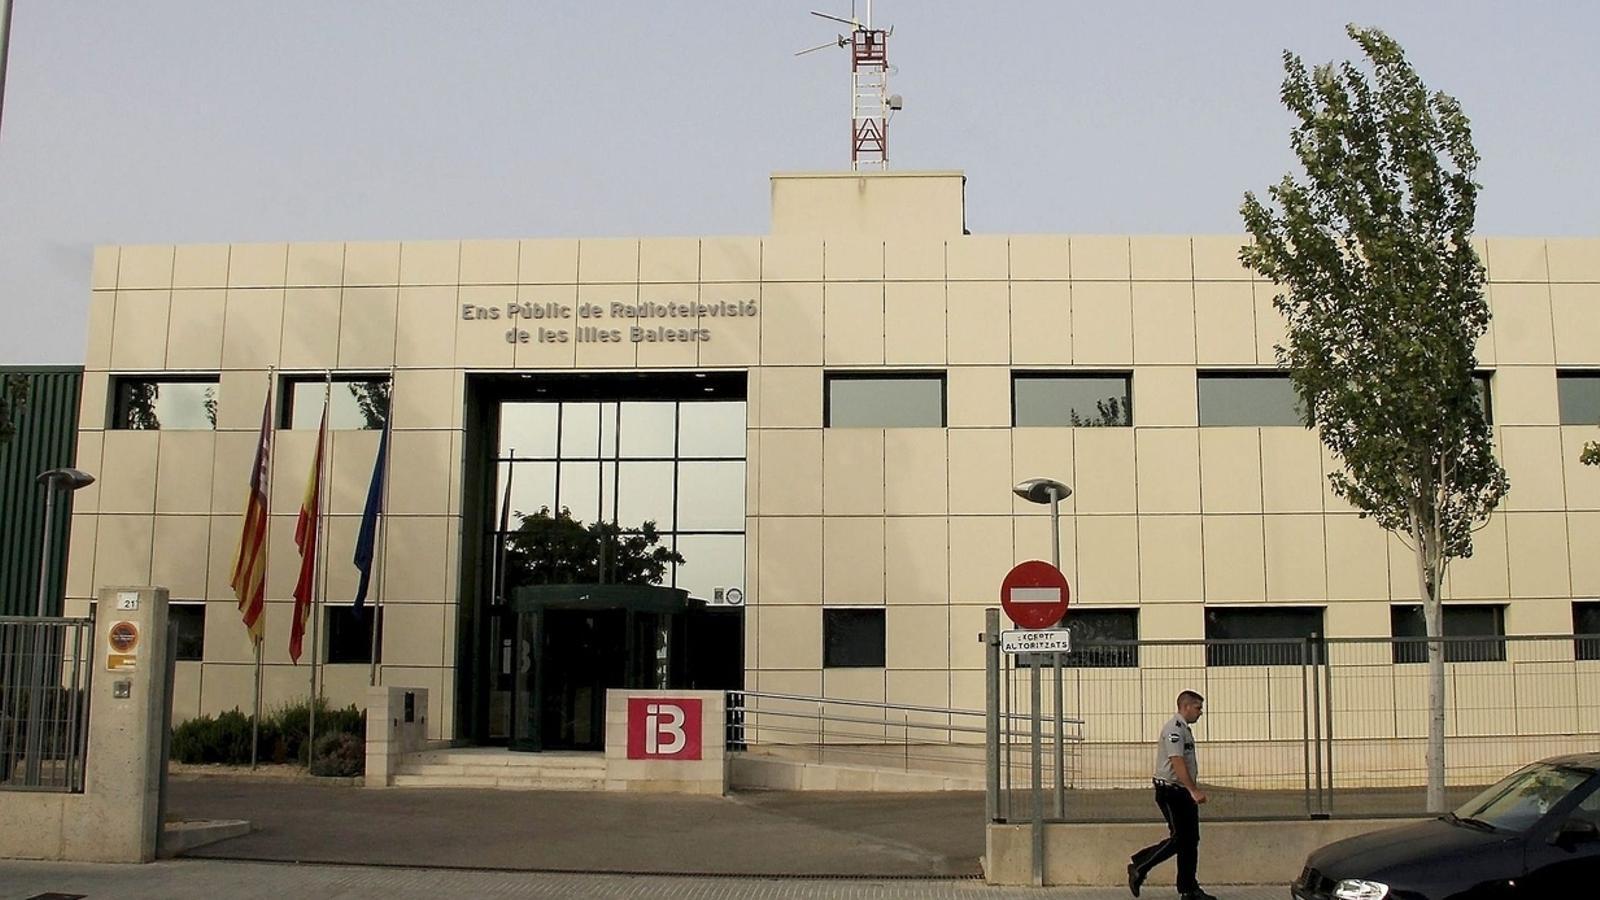 Edifici d'IB3 al polígon de Son Bugadelles